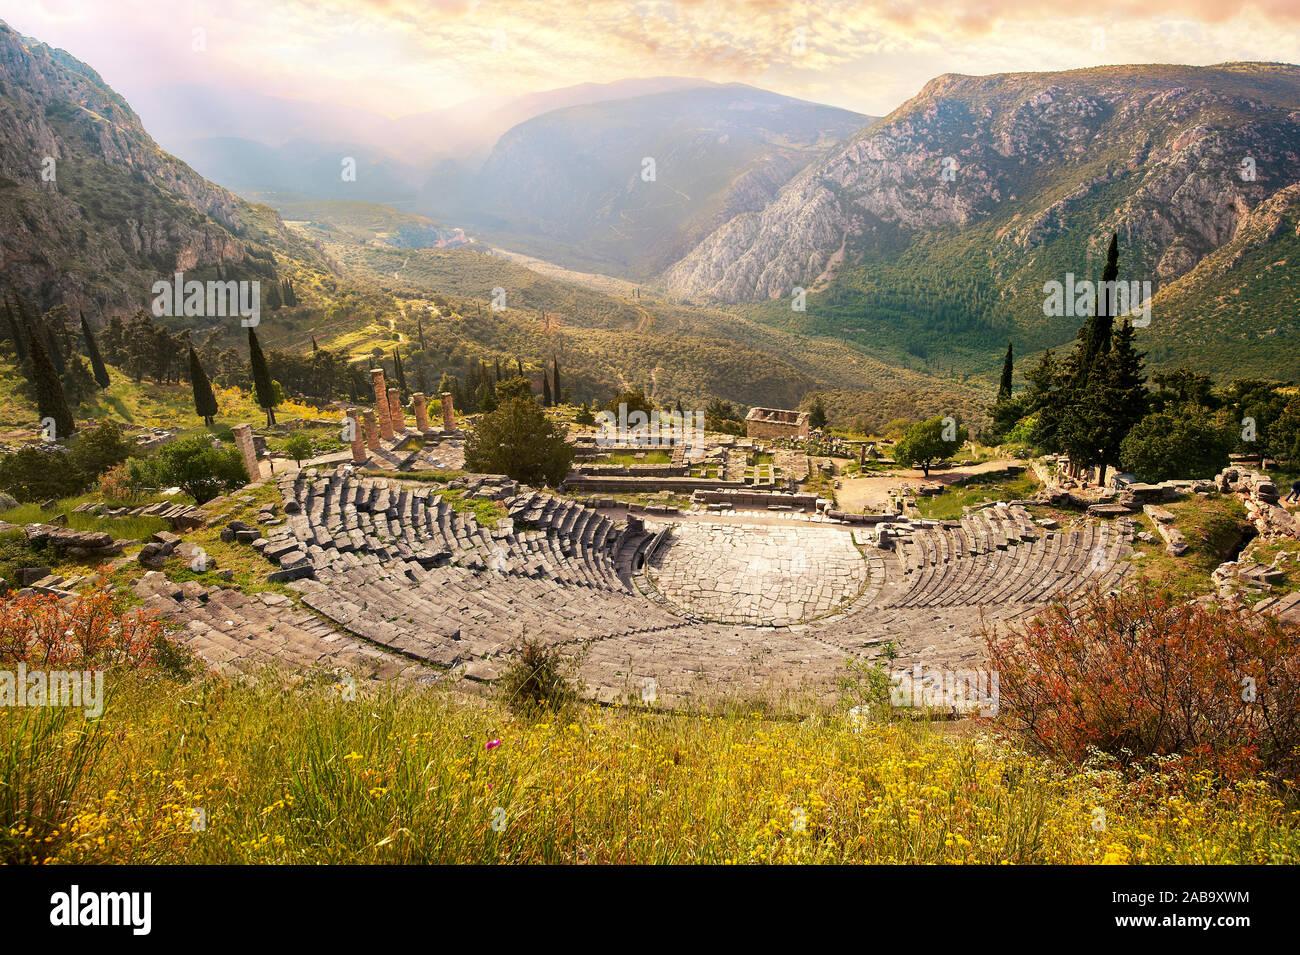 Ancient Greek Theatre of Delphi, Delphi Archaeological site, Delphi, Greece Stock Photo